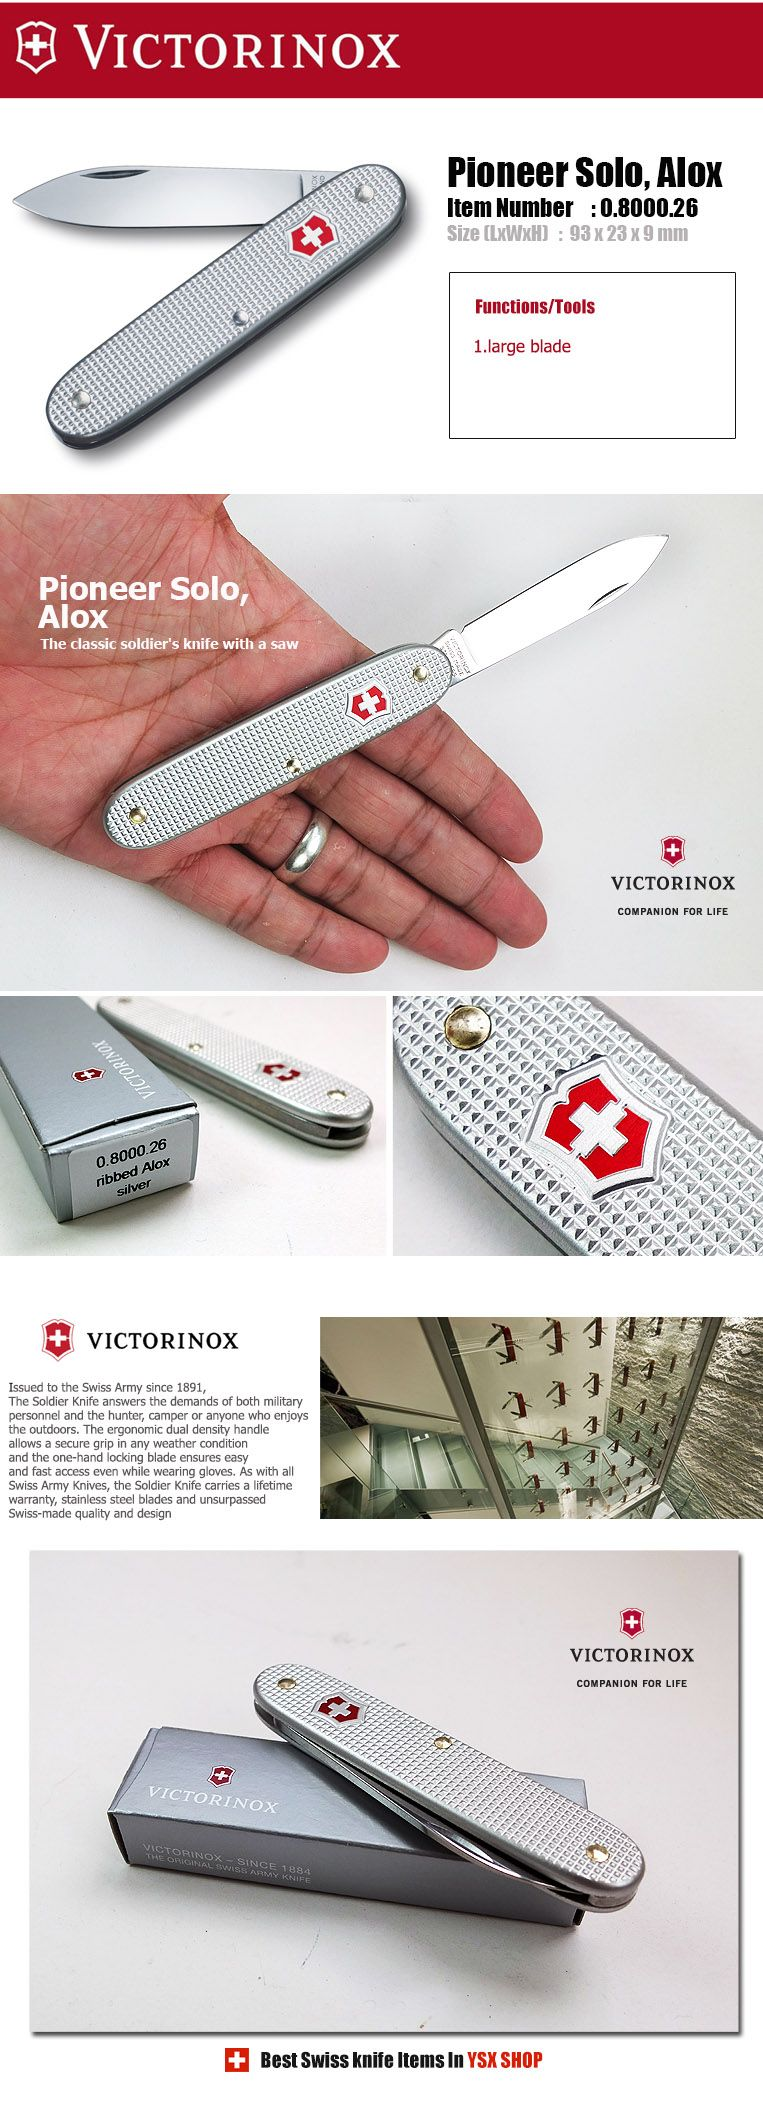 Victorinox Swiss Army Knife 93mm Pioneer Solo Blade Alox